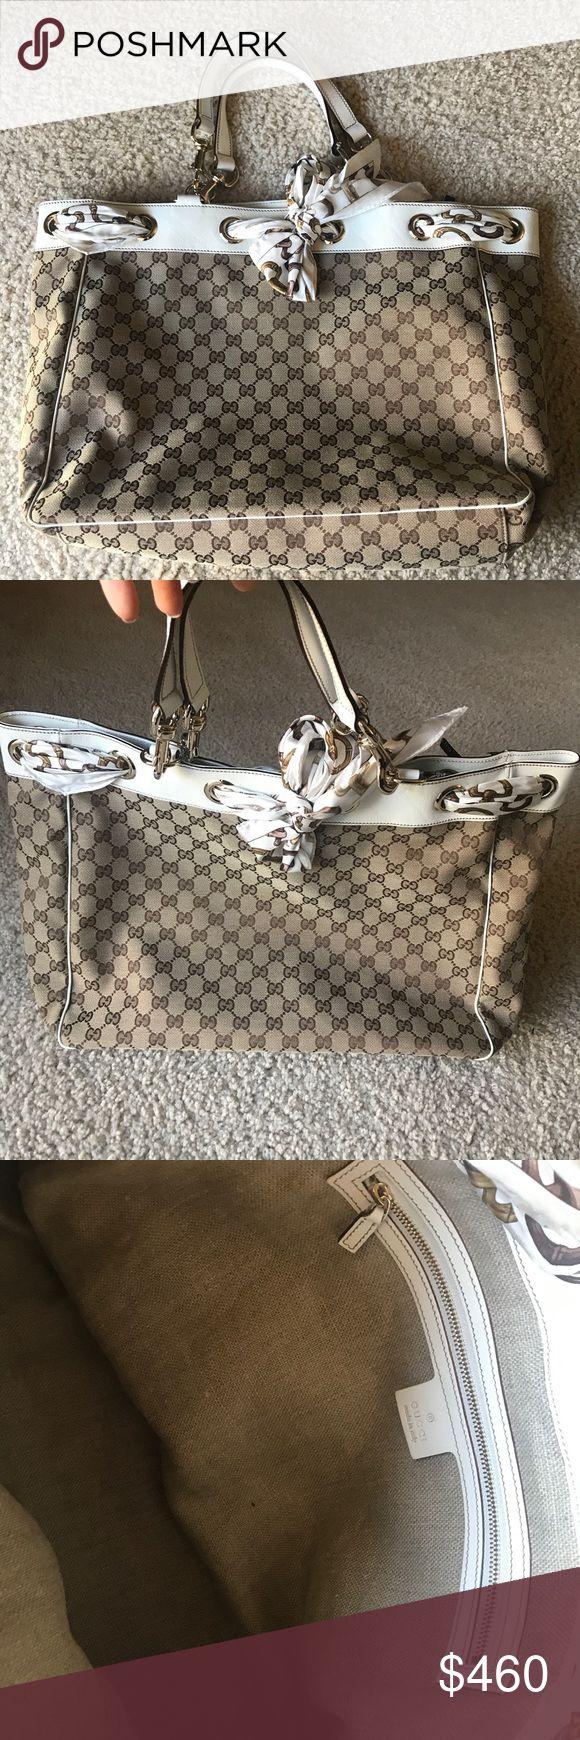 Gucci monogram handbag,new,no receipts,100% real! Gucci monogram handbag,new,no receipts,100% authentic!!!! Gucci Bags Totes